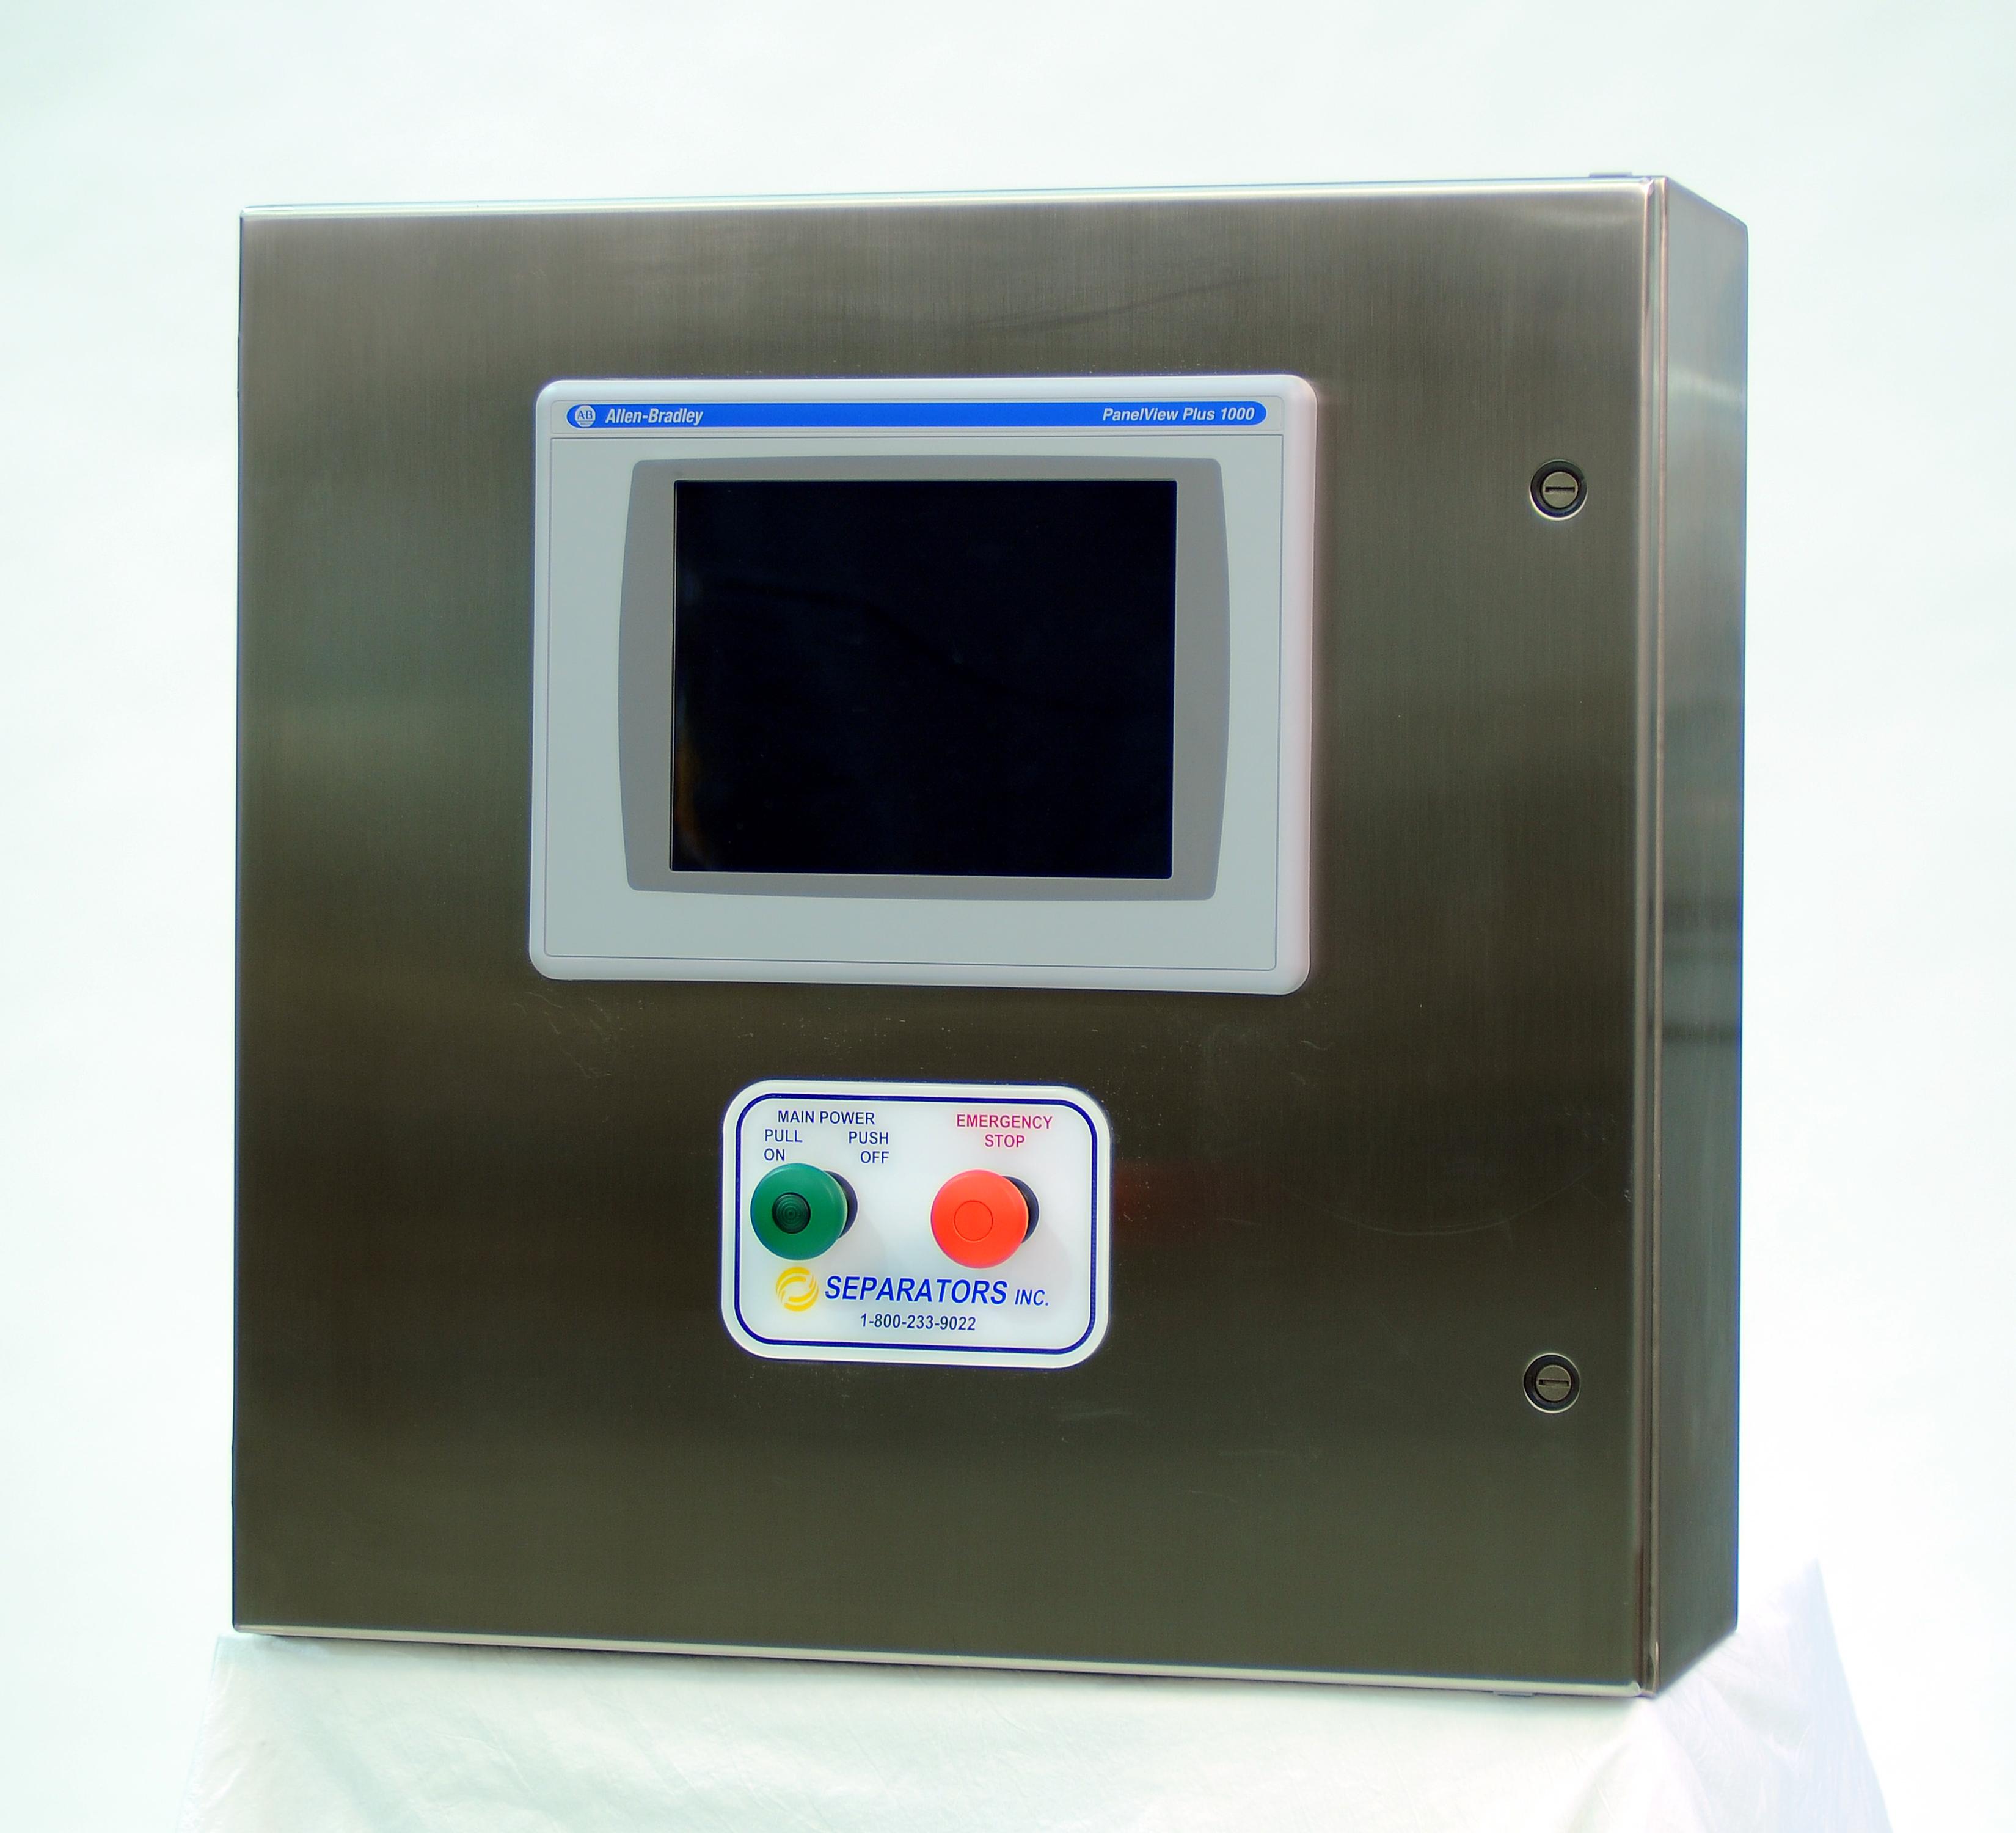 C3205 Series Control Panel